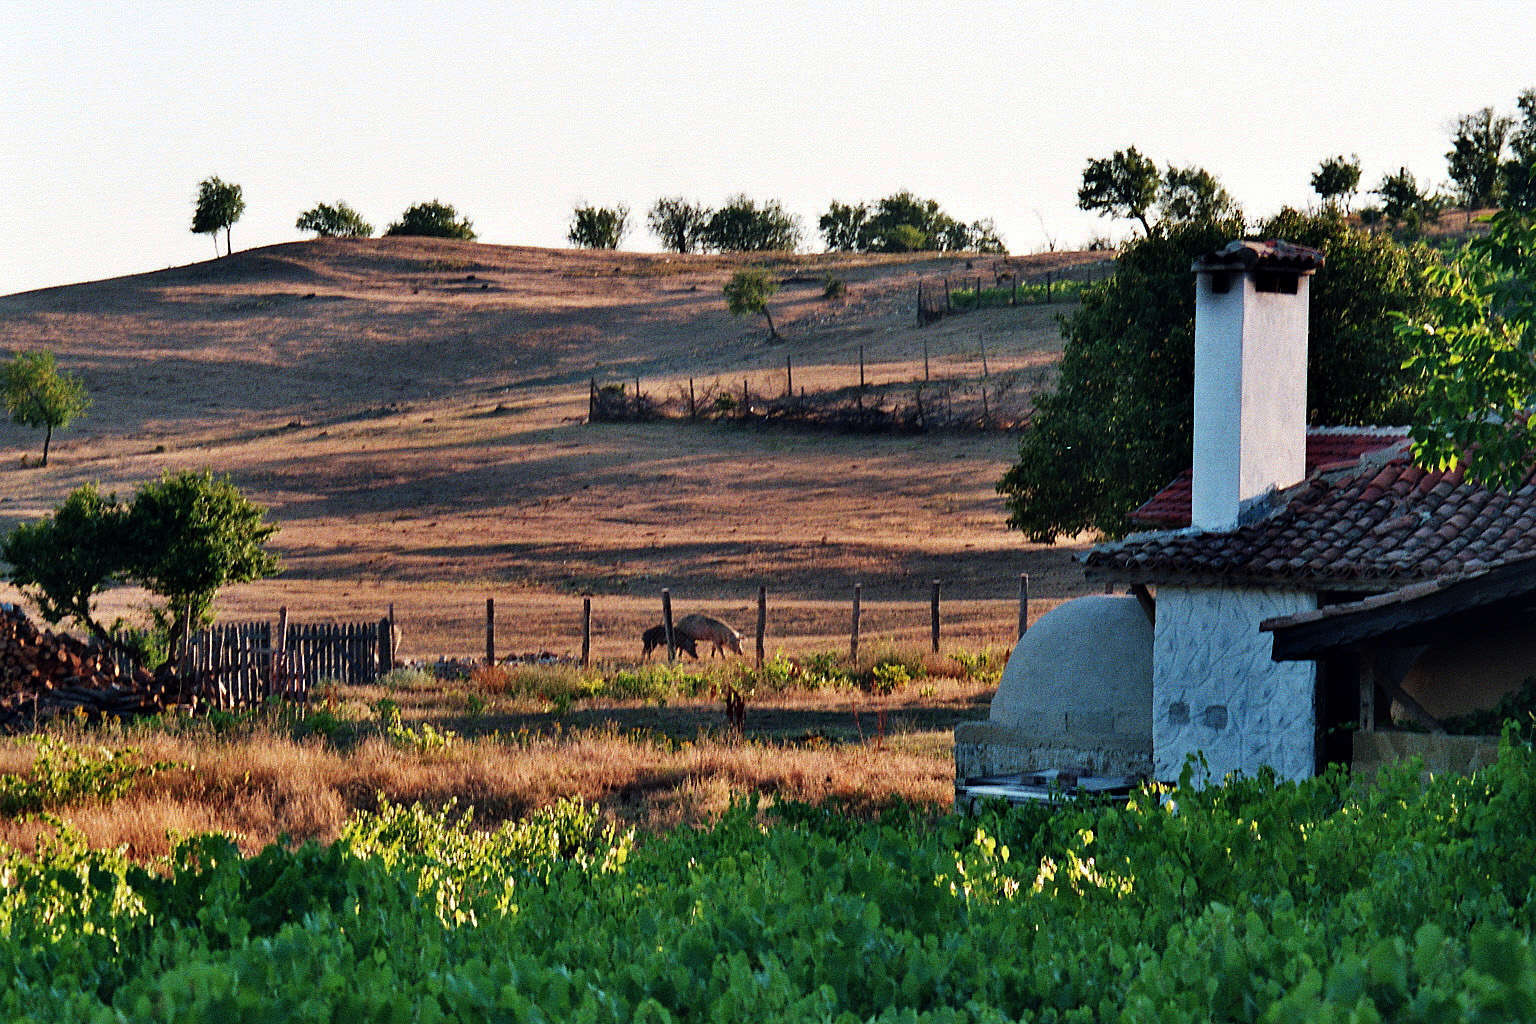 Garten Und Backofen Foto Bild Europe Balkans Bulgaria Bilder